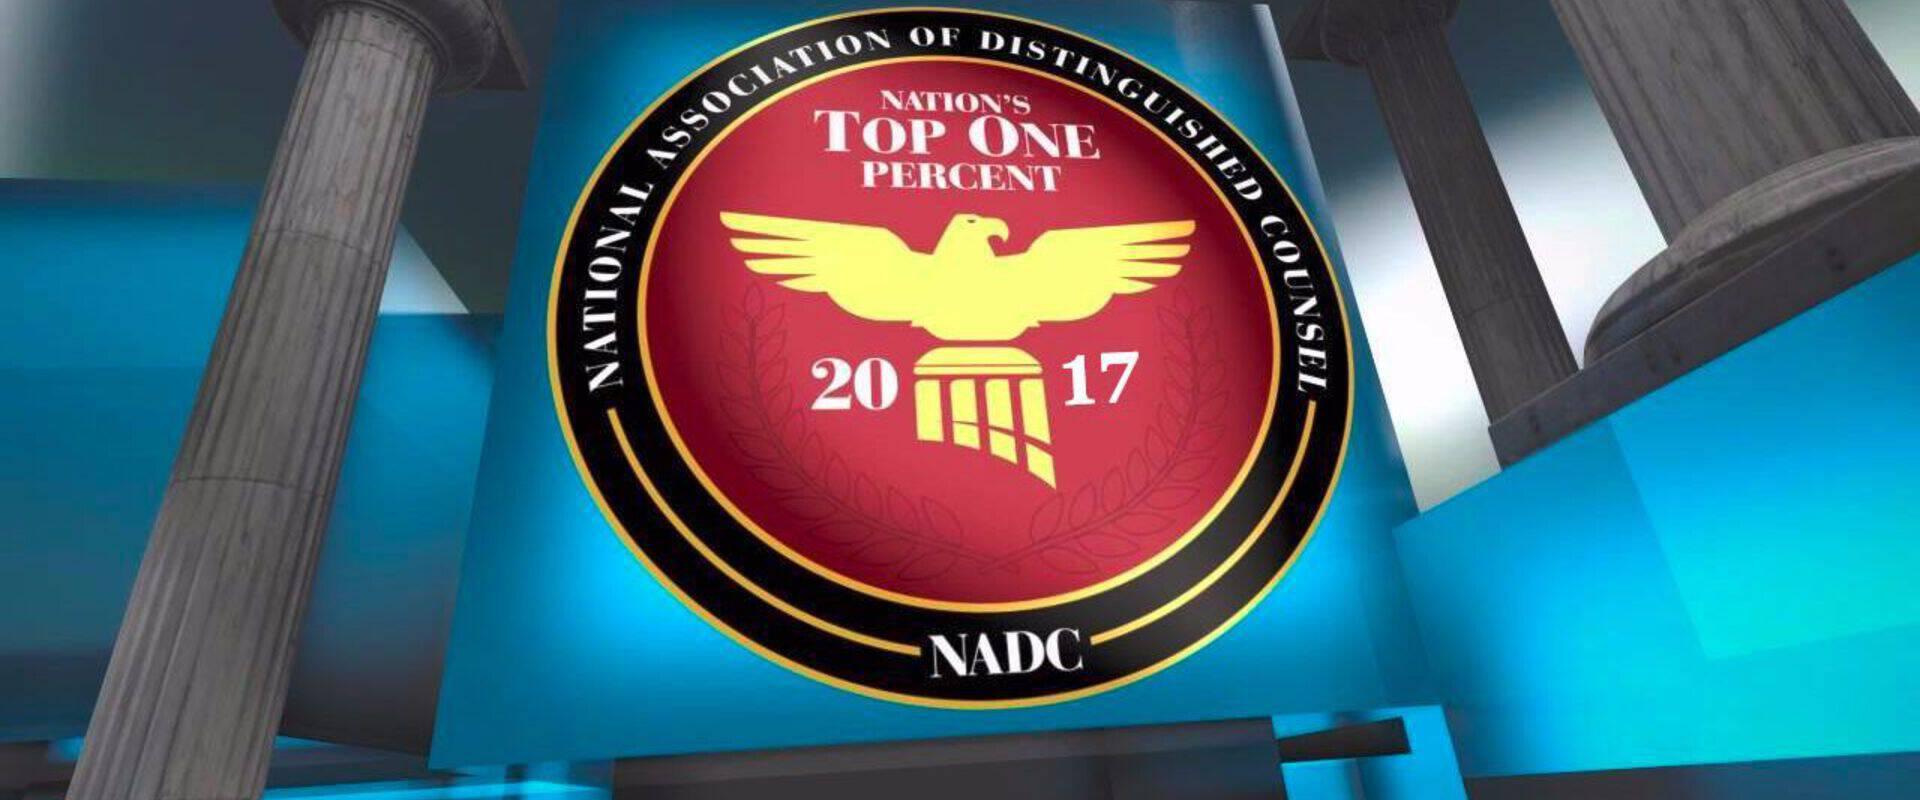 Steven Milligram selected as 2017 member of Nation's Top One Percent